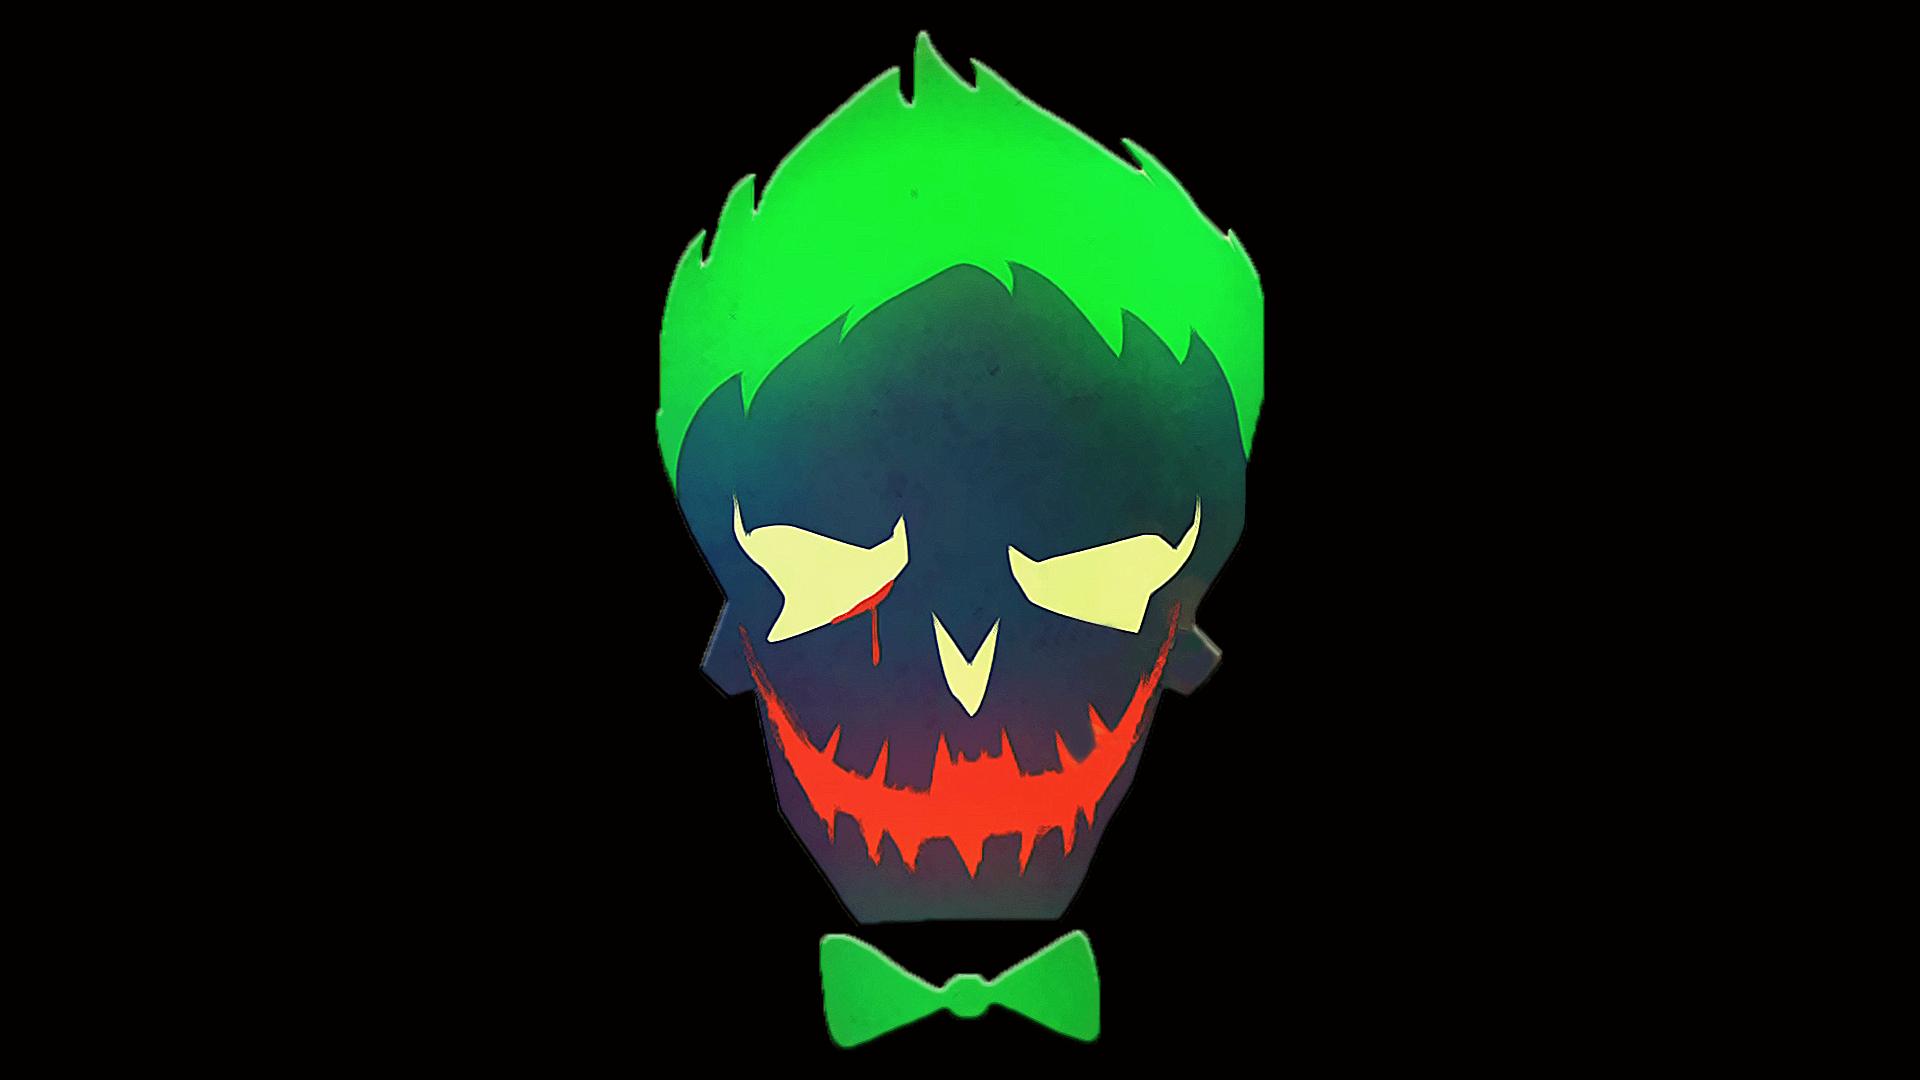 Suicide Squad Joker Wallpapers Wallpaper Cave